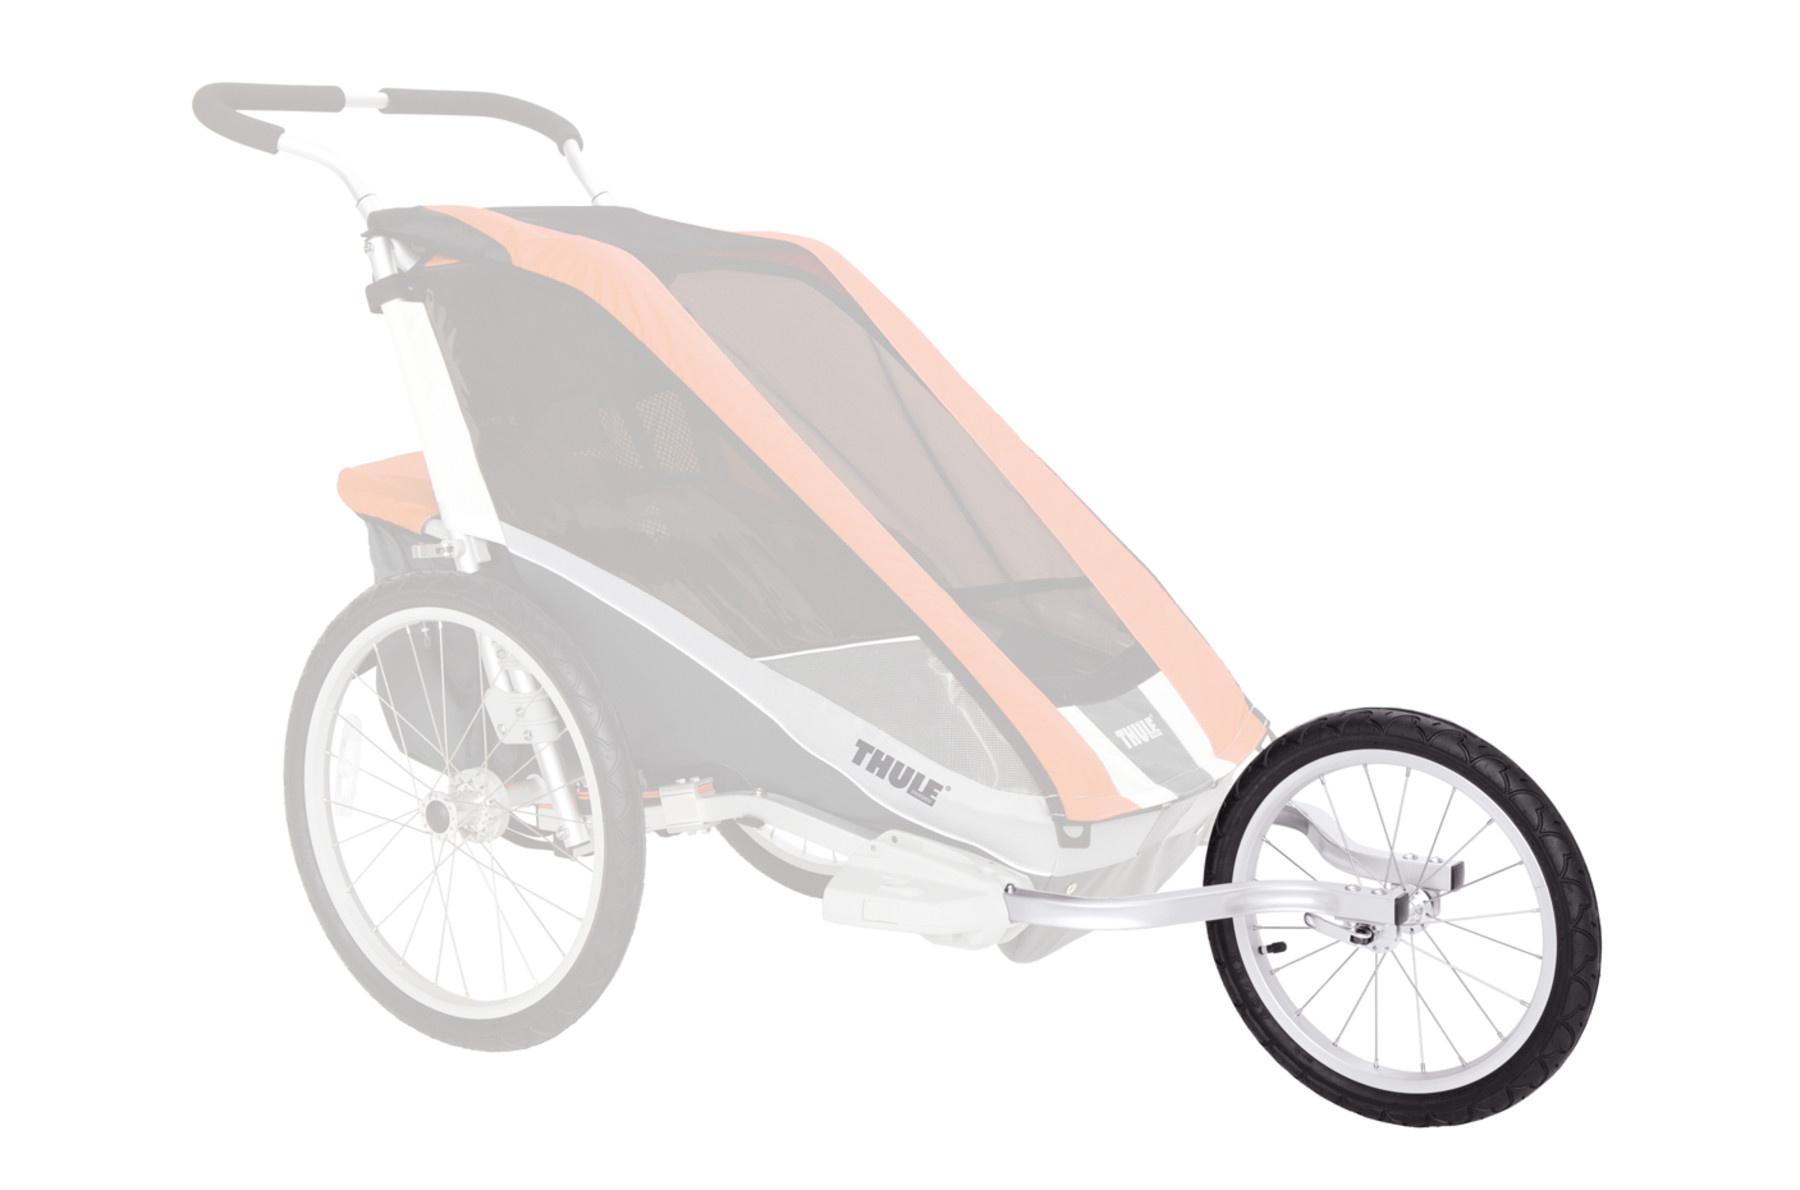 Thule Chariot Jog Kit 1 - Cheetah XT